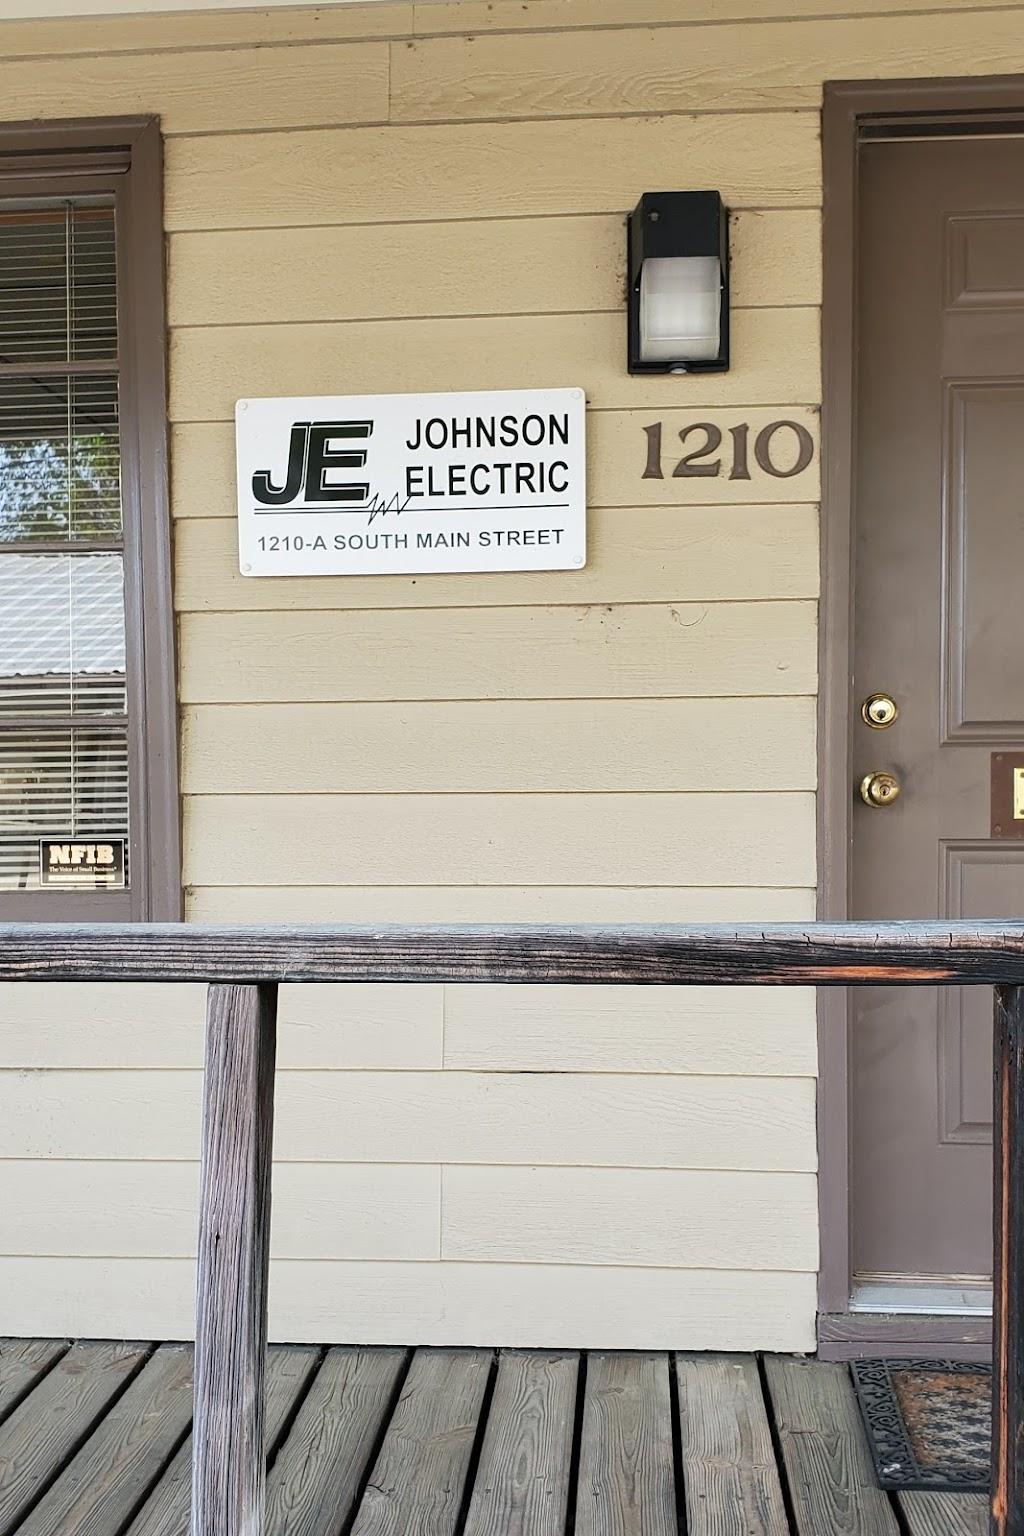 Johnson Electric - electrician  | Photo 1 of 2 | Address: 1210 S Main St A, Lexington, NC 27292, USA | Phone: (336) 248-8331